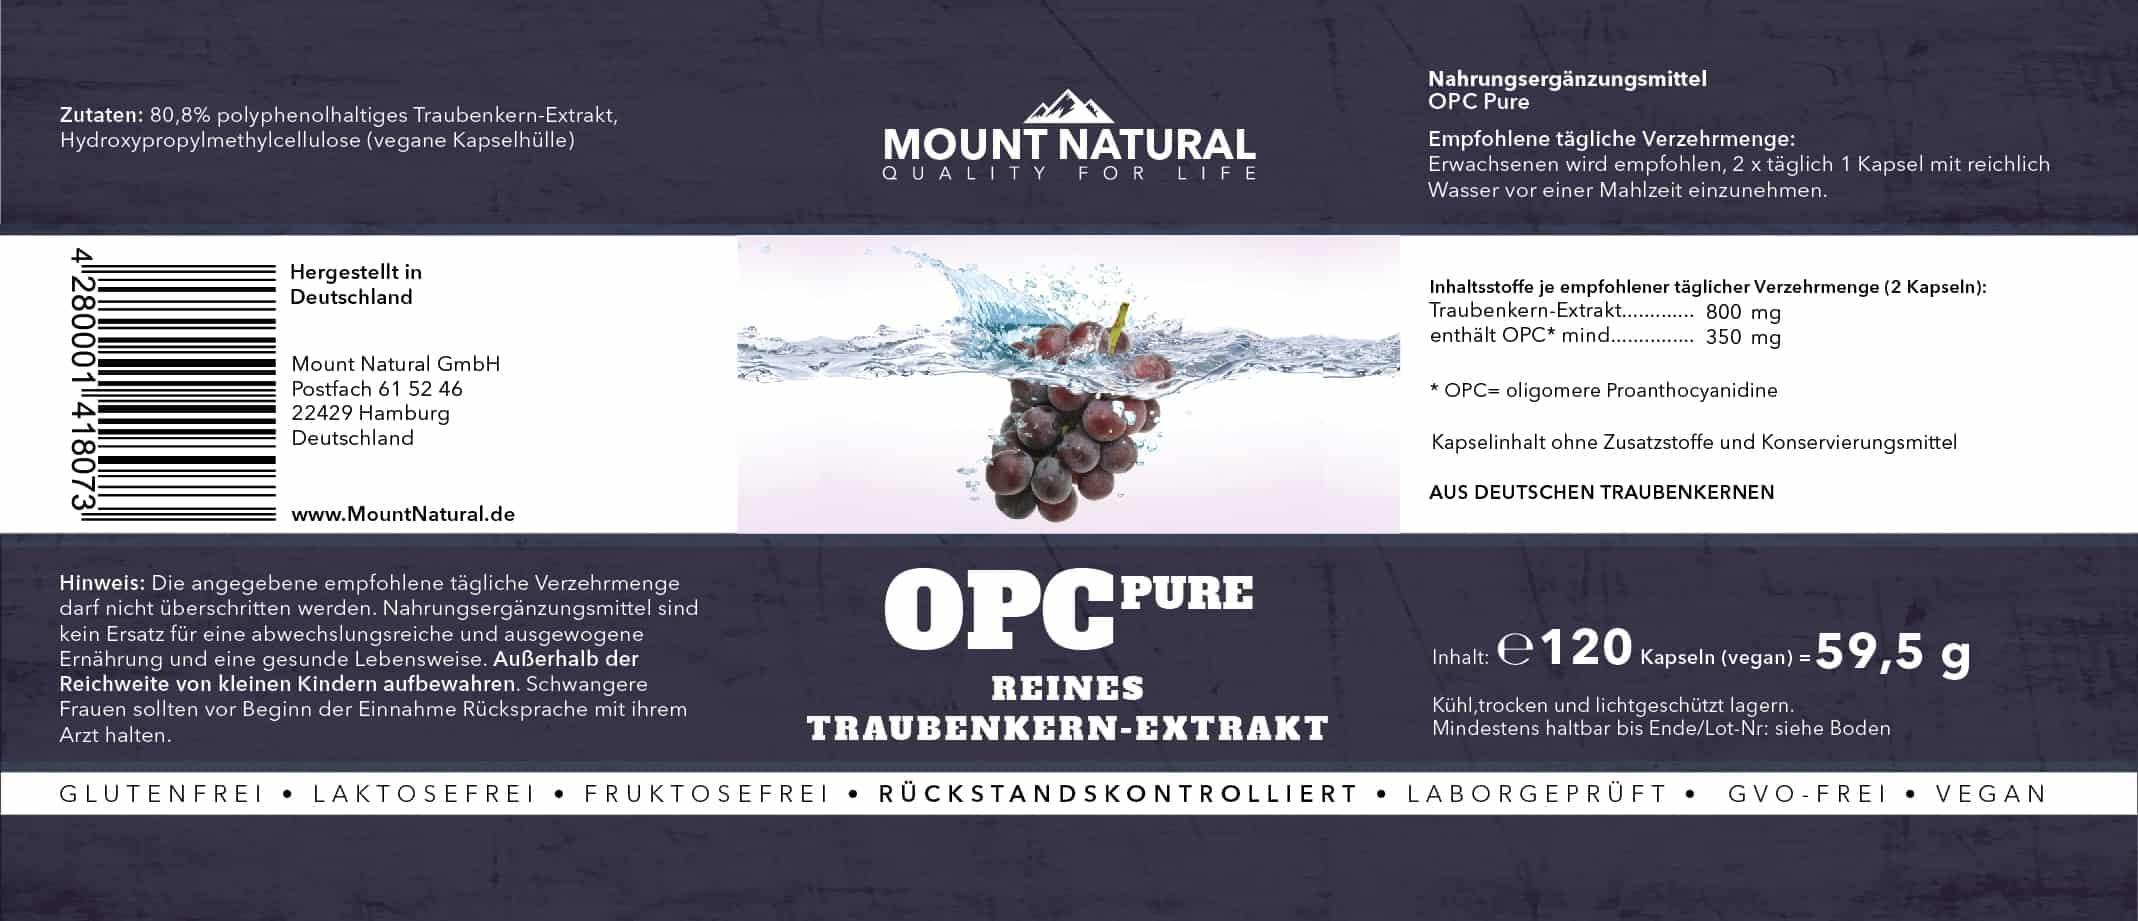 opcpure_label